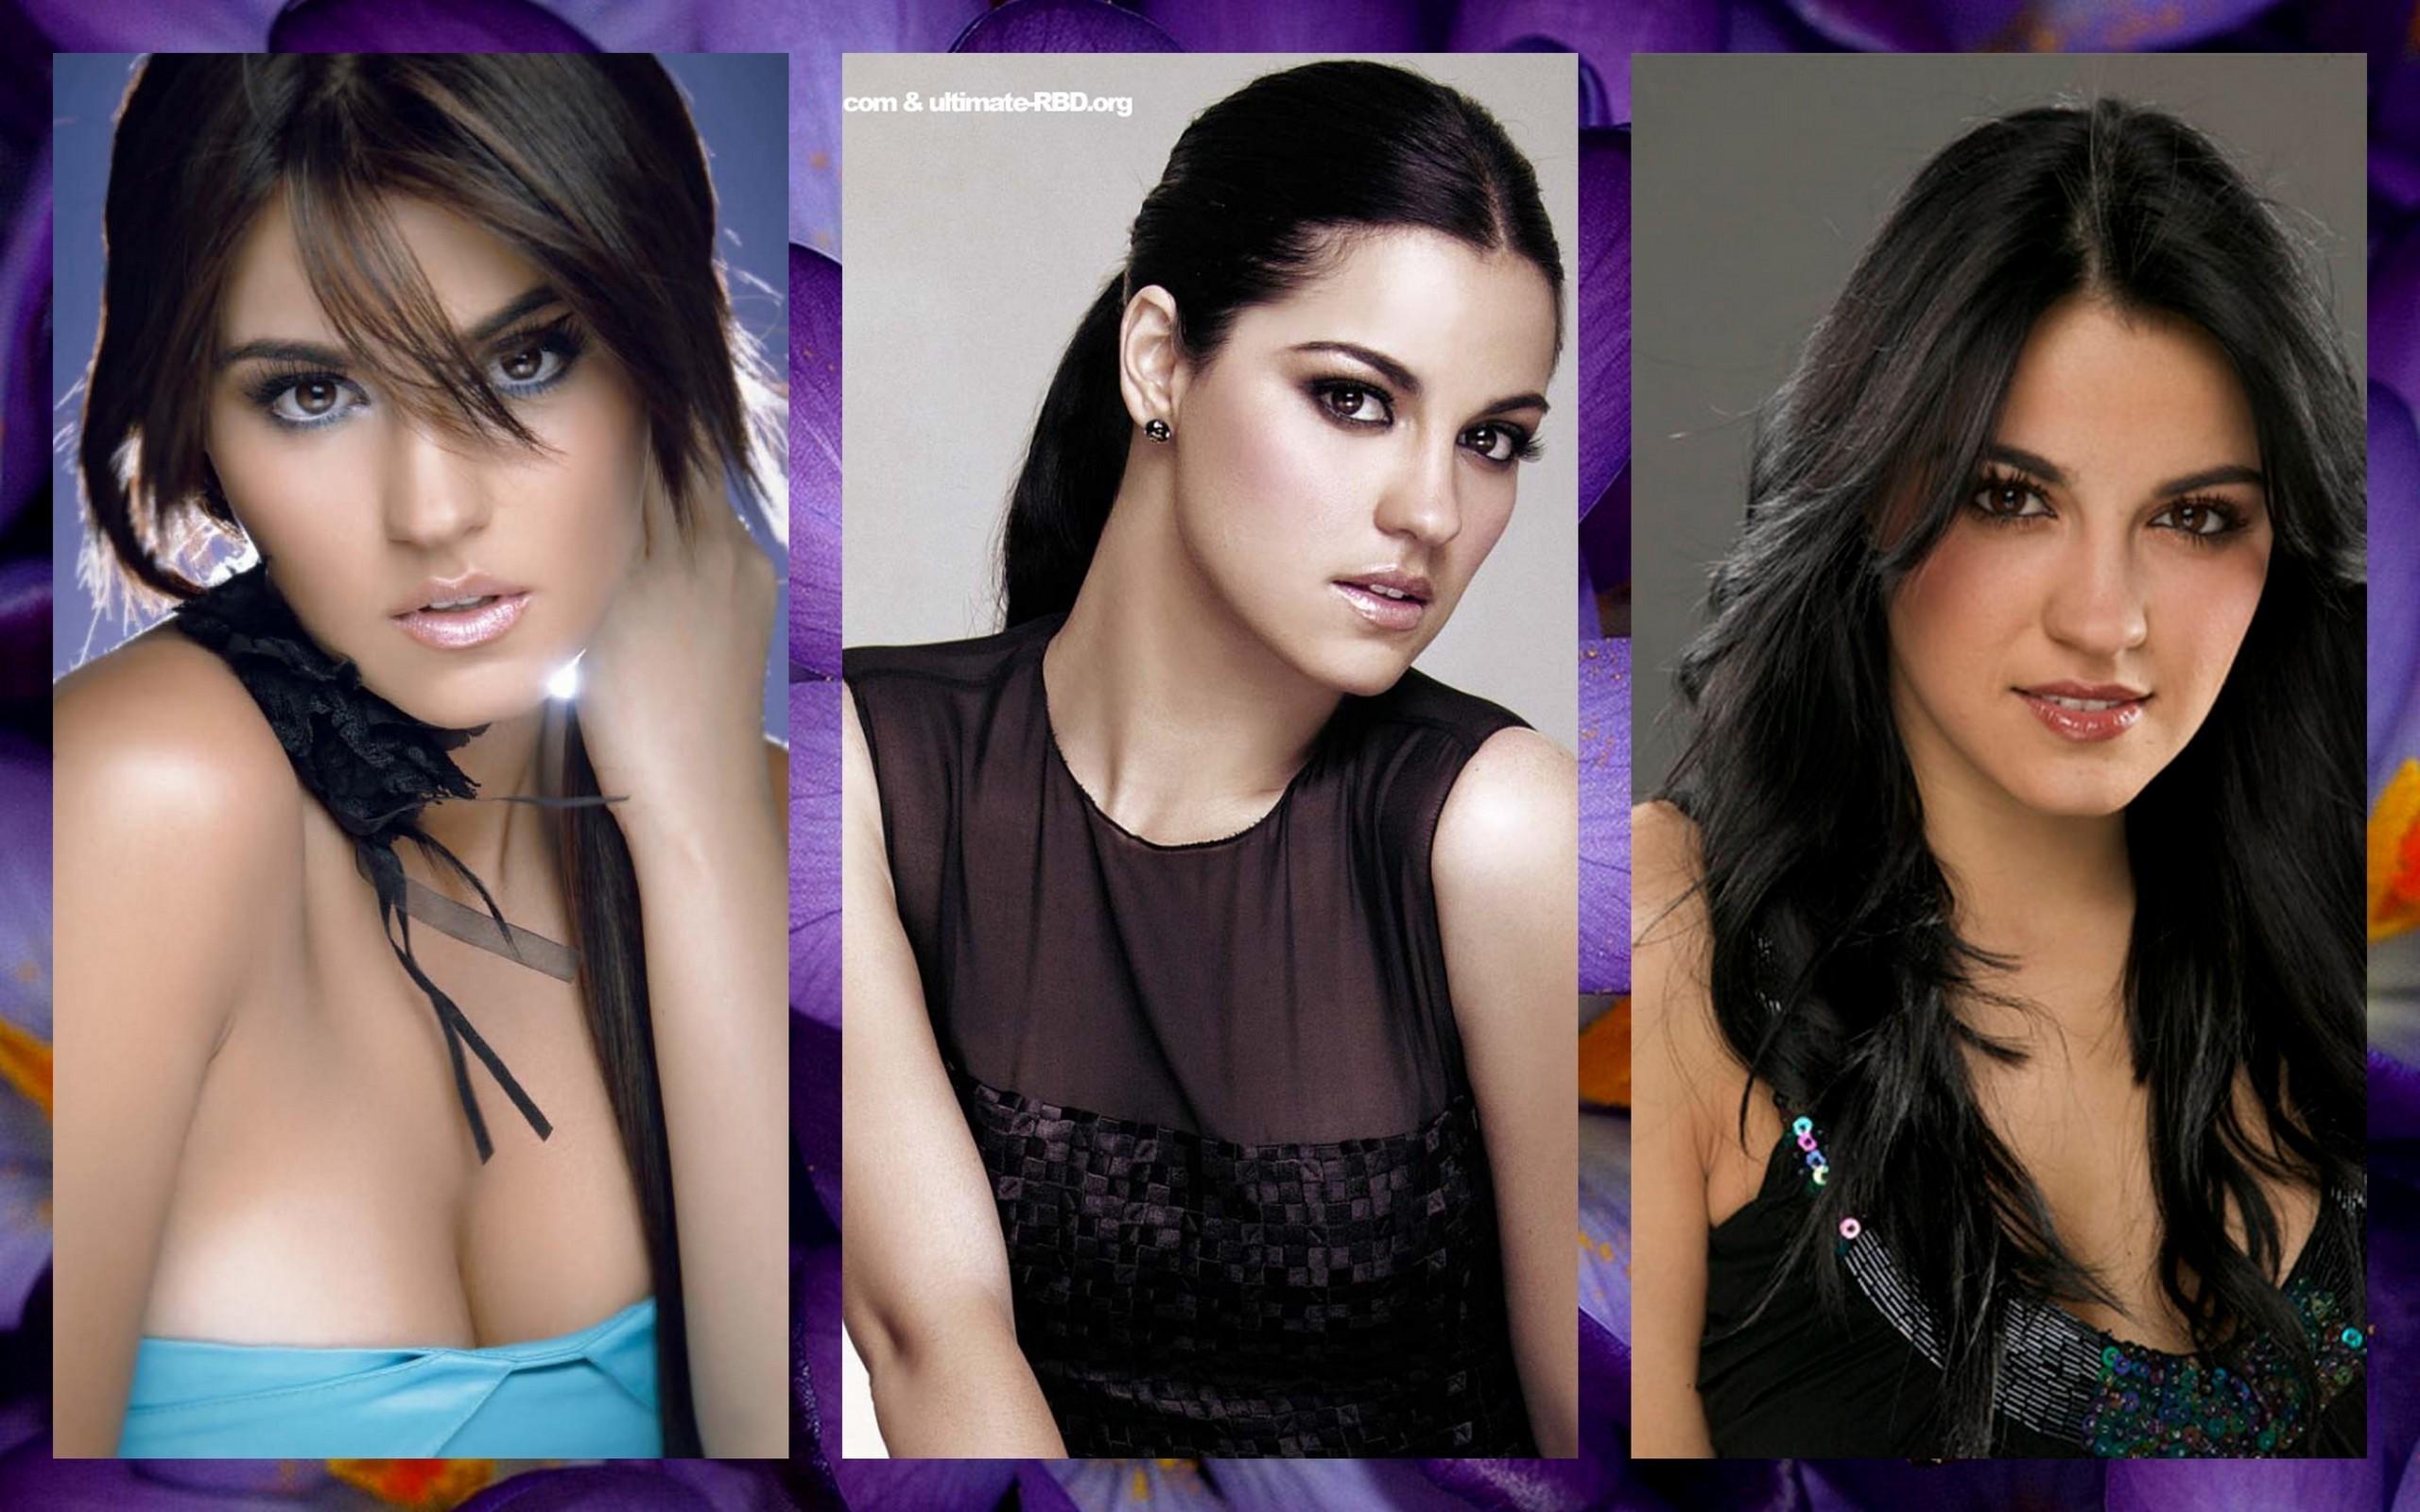 images4.fanpop.com/image/photos/17300000/Maite-Wallpaper-anahi-and-dulcemaria-and-maite-17396737-2560-1600.jpg